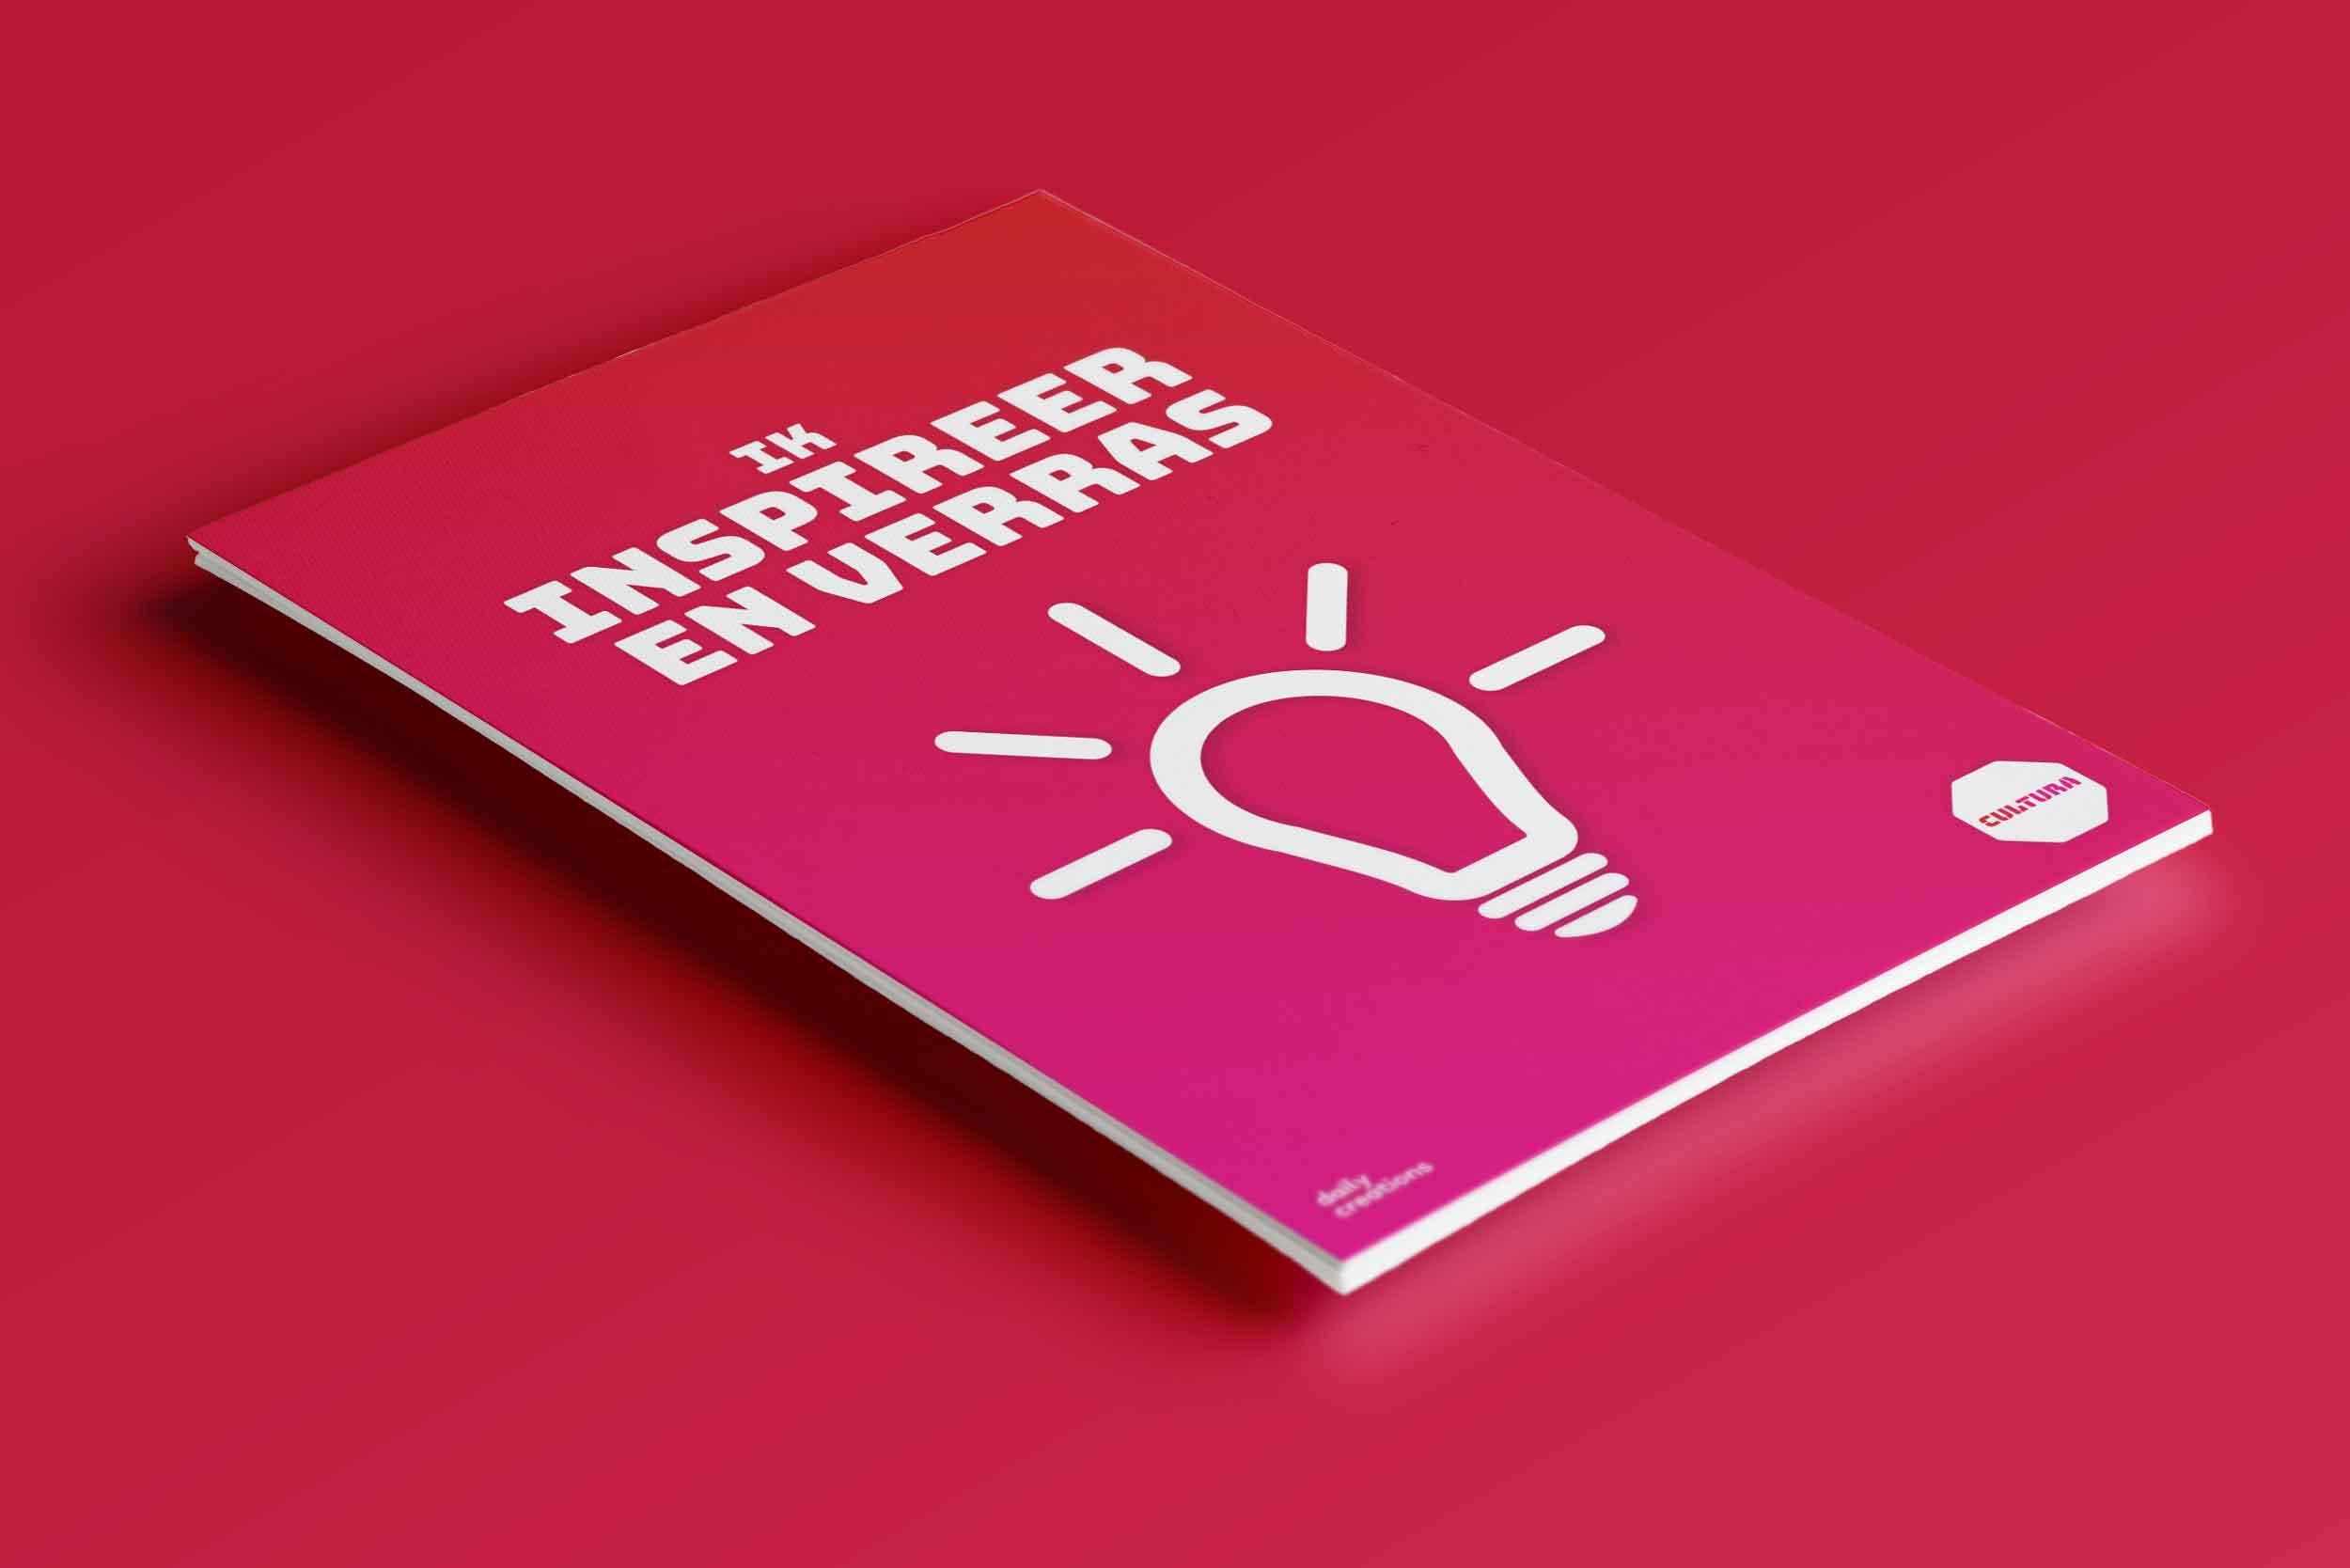 Poster design principle 4